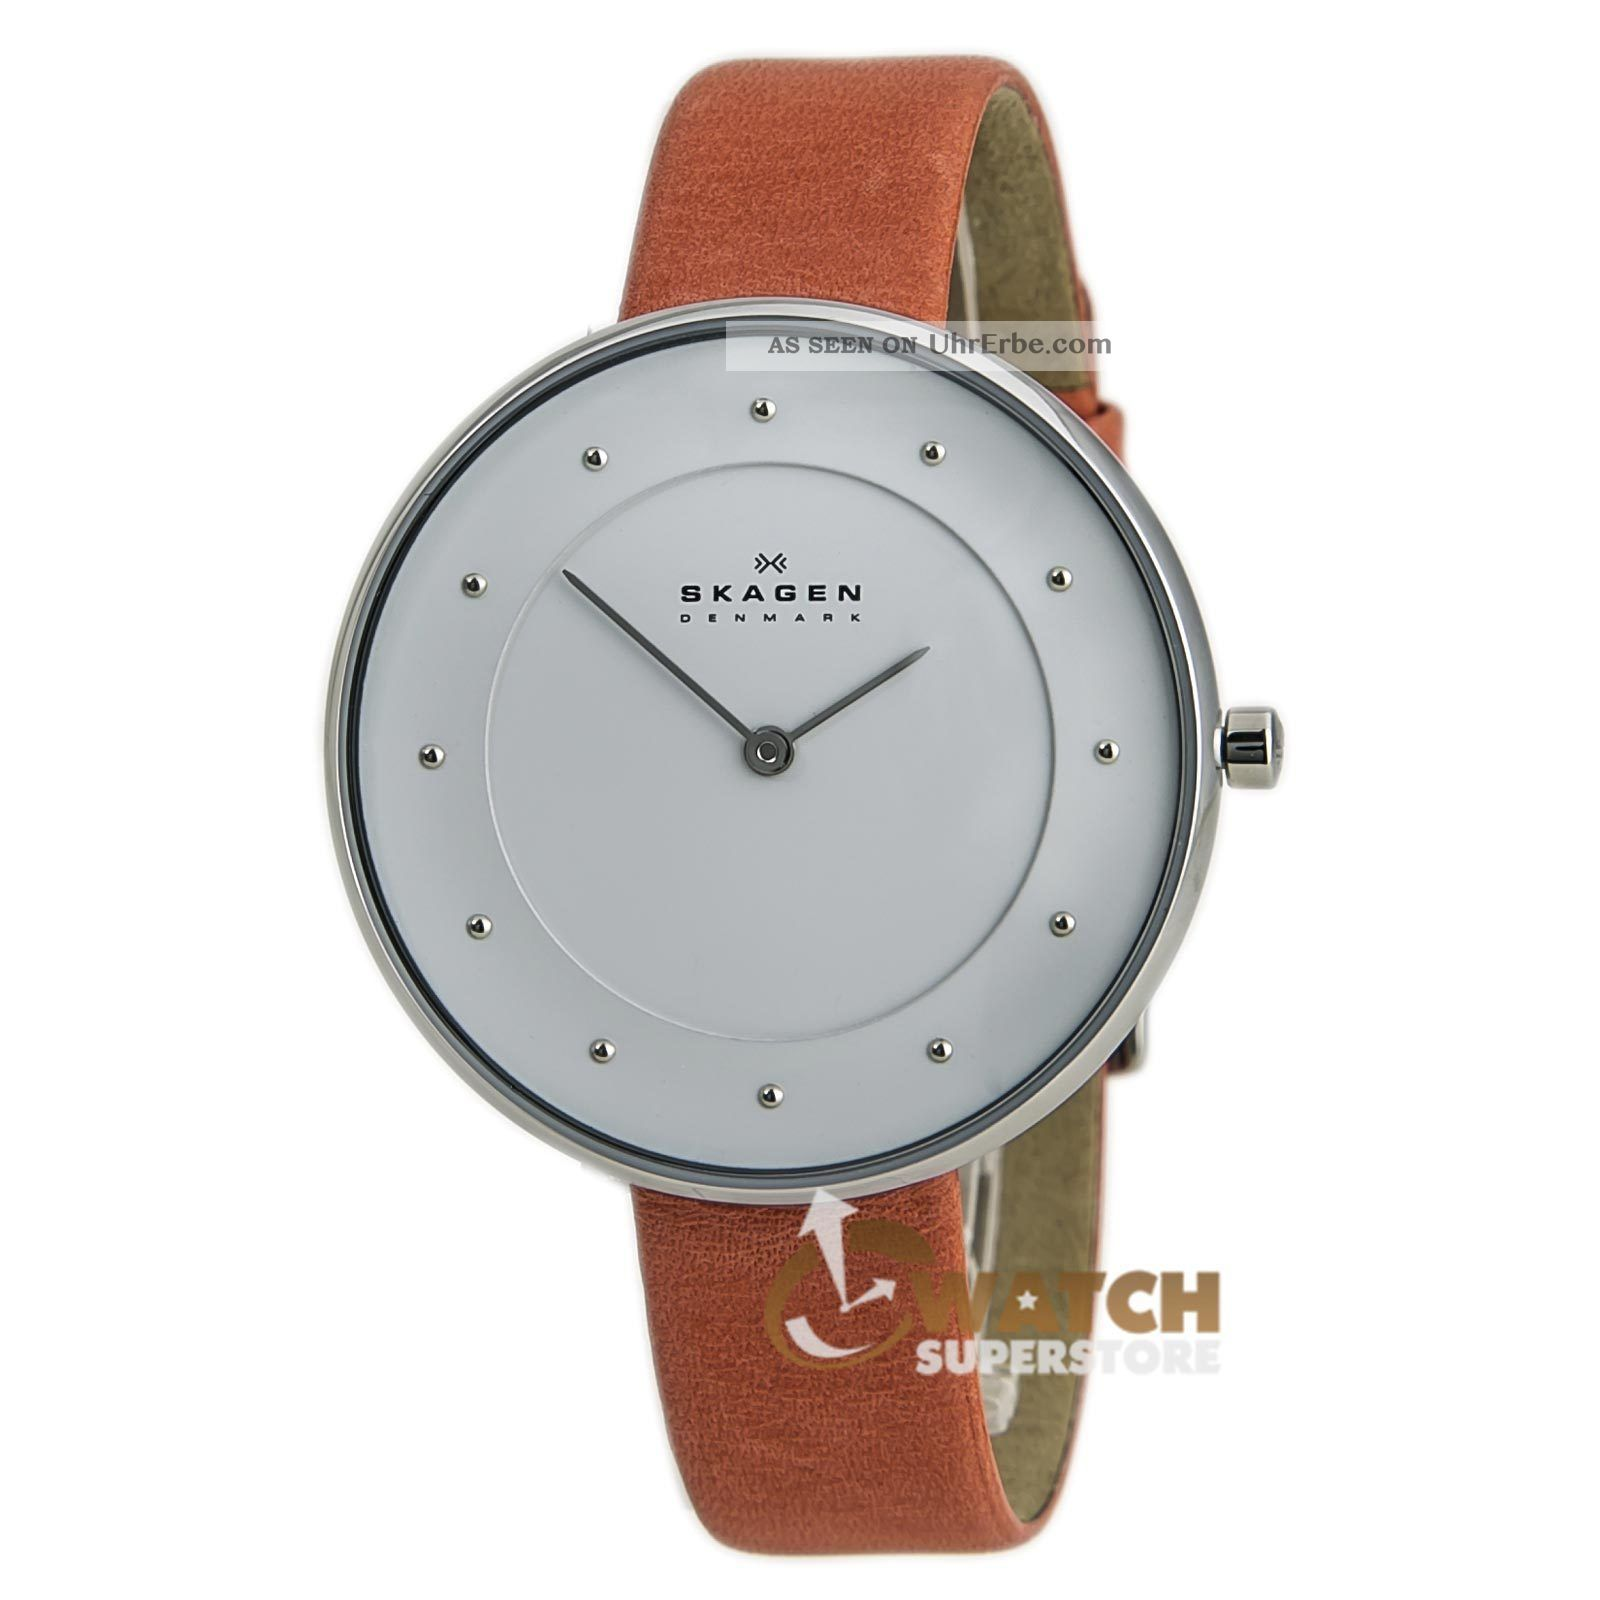 damen armbanduhr skagen skw2135 denmark zifferblatt wei. Black Bedroom Furniture Sets. Home Design Ideas